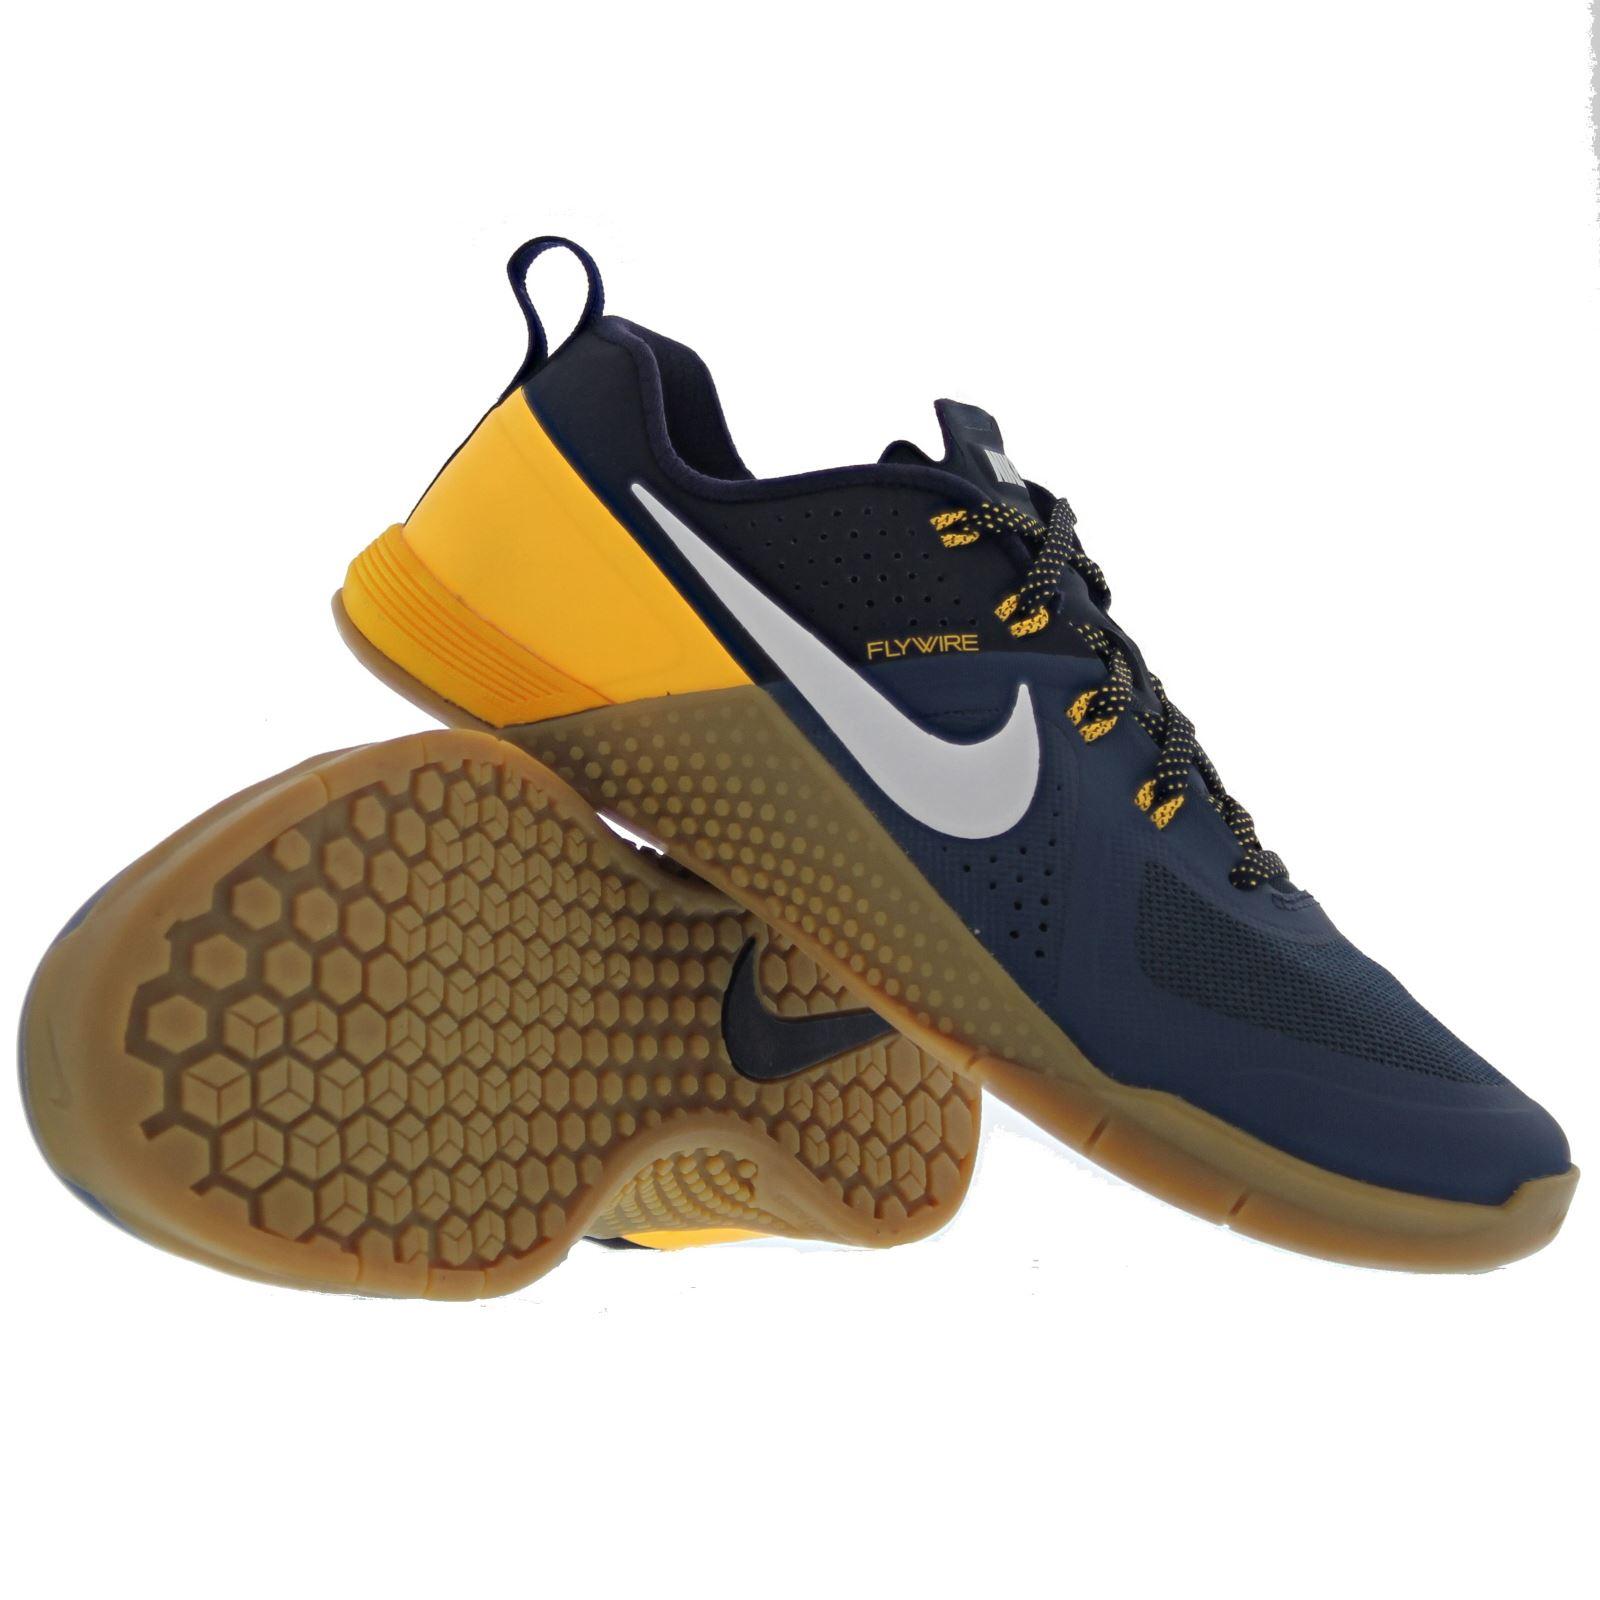 nike femme blazer - Nike Metcon 1 Blue Mens Trainers - 704688-410 | eBay